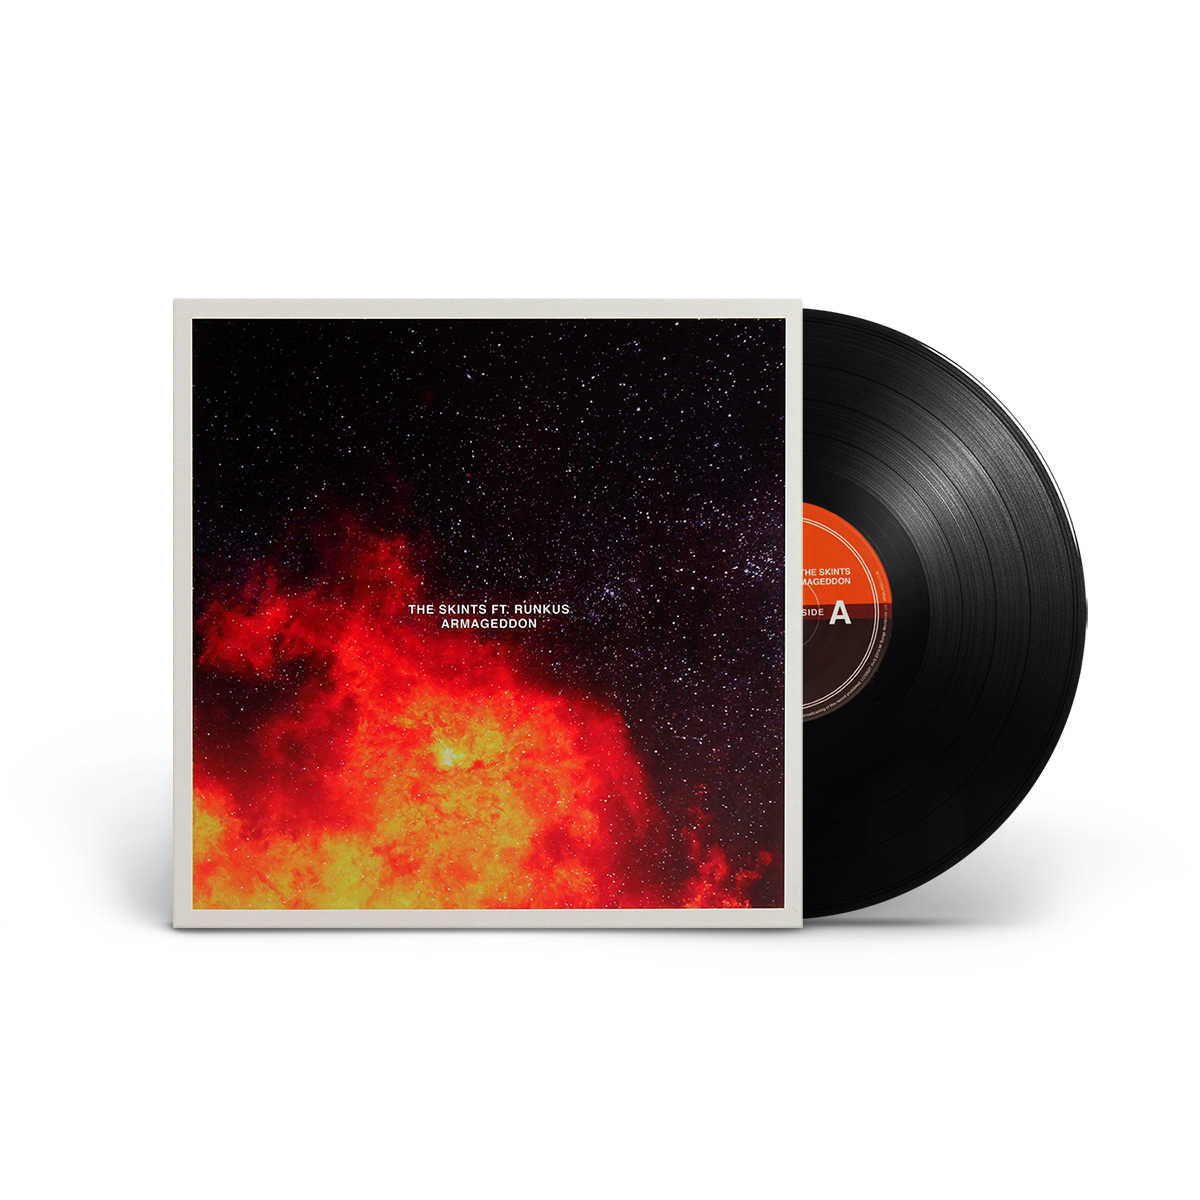 "The Skints ""Armageddon"" Limited-Edition 7"" Vinyl Single"